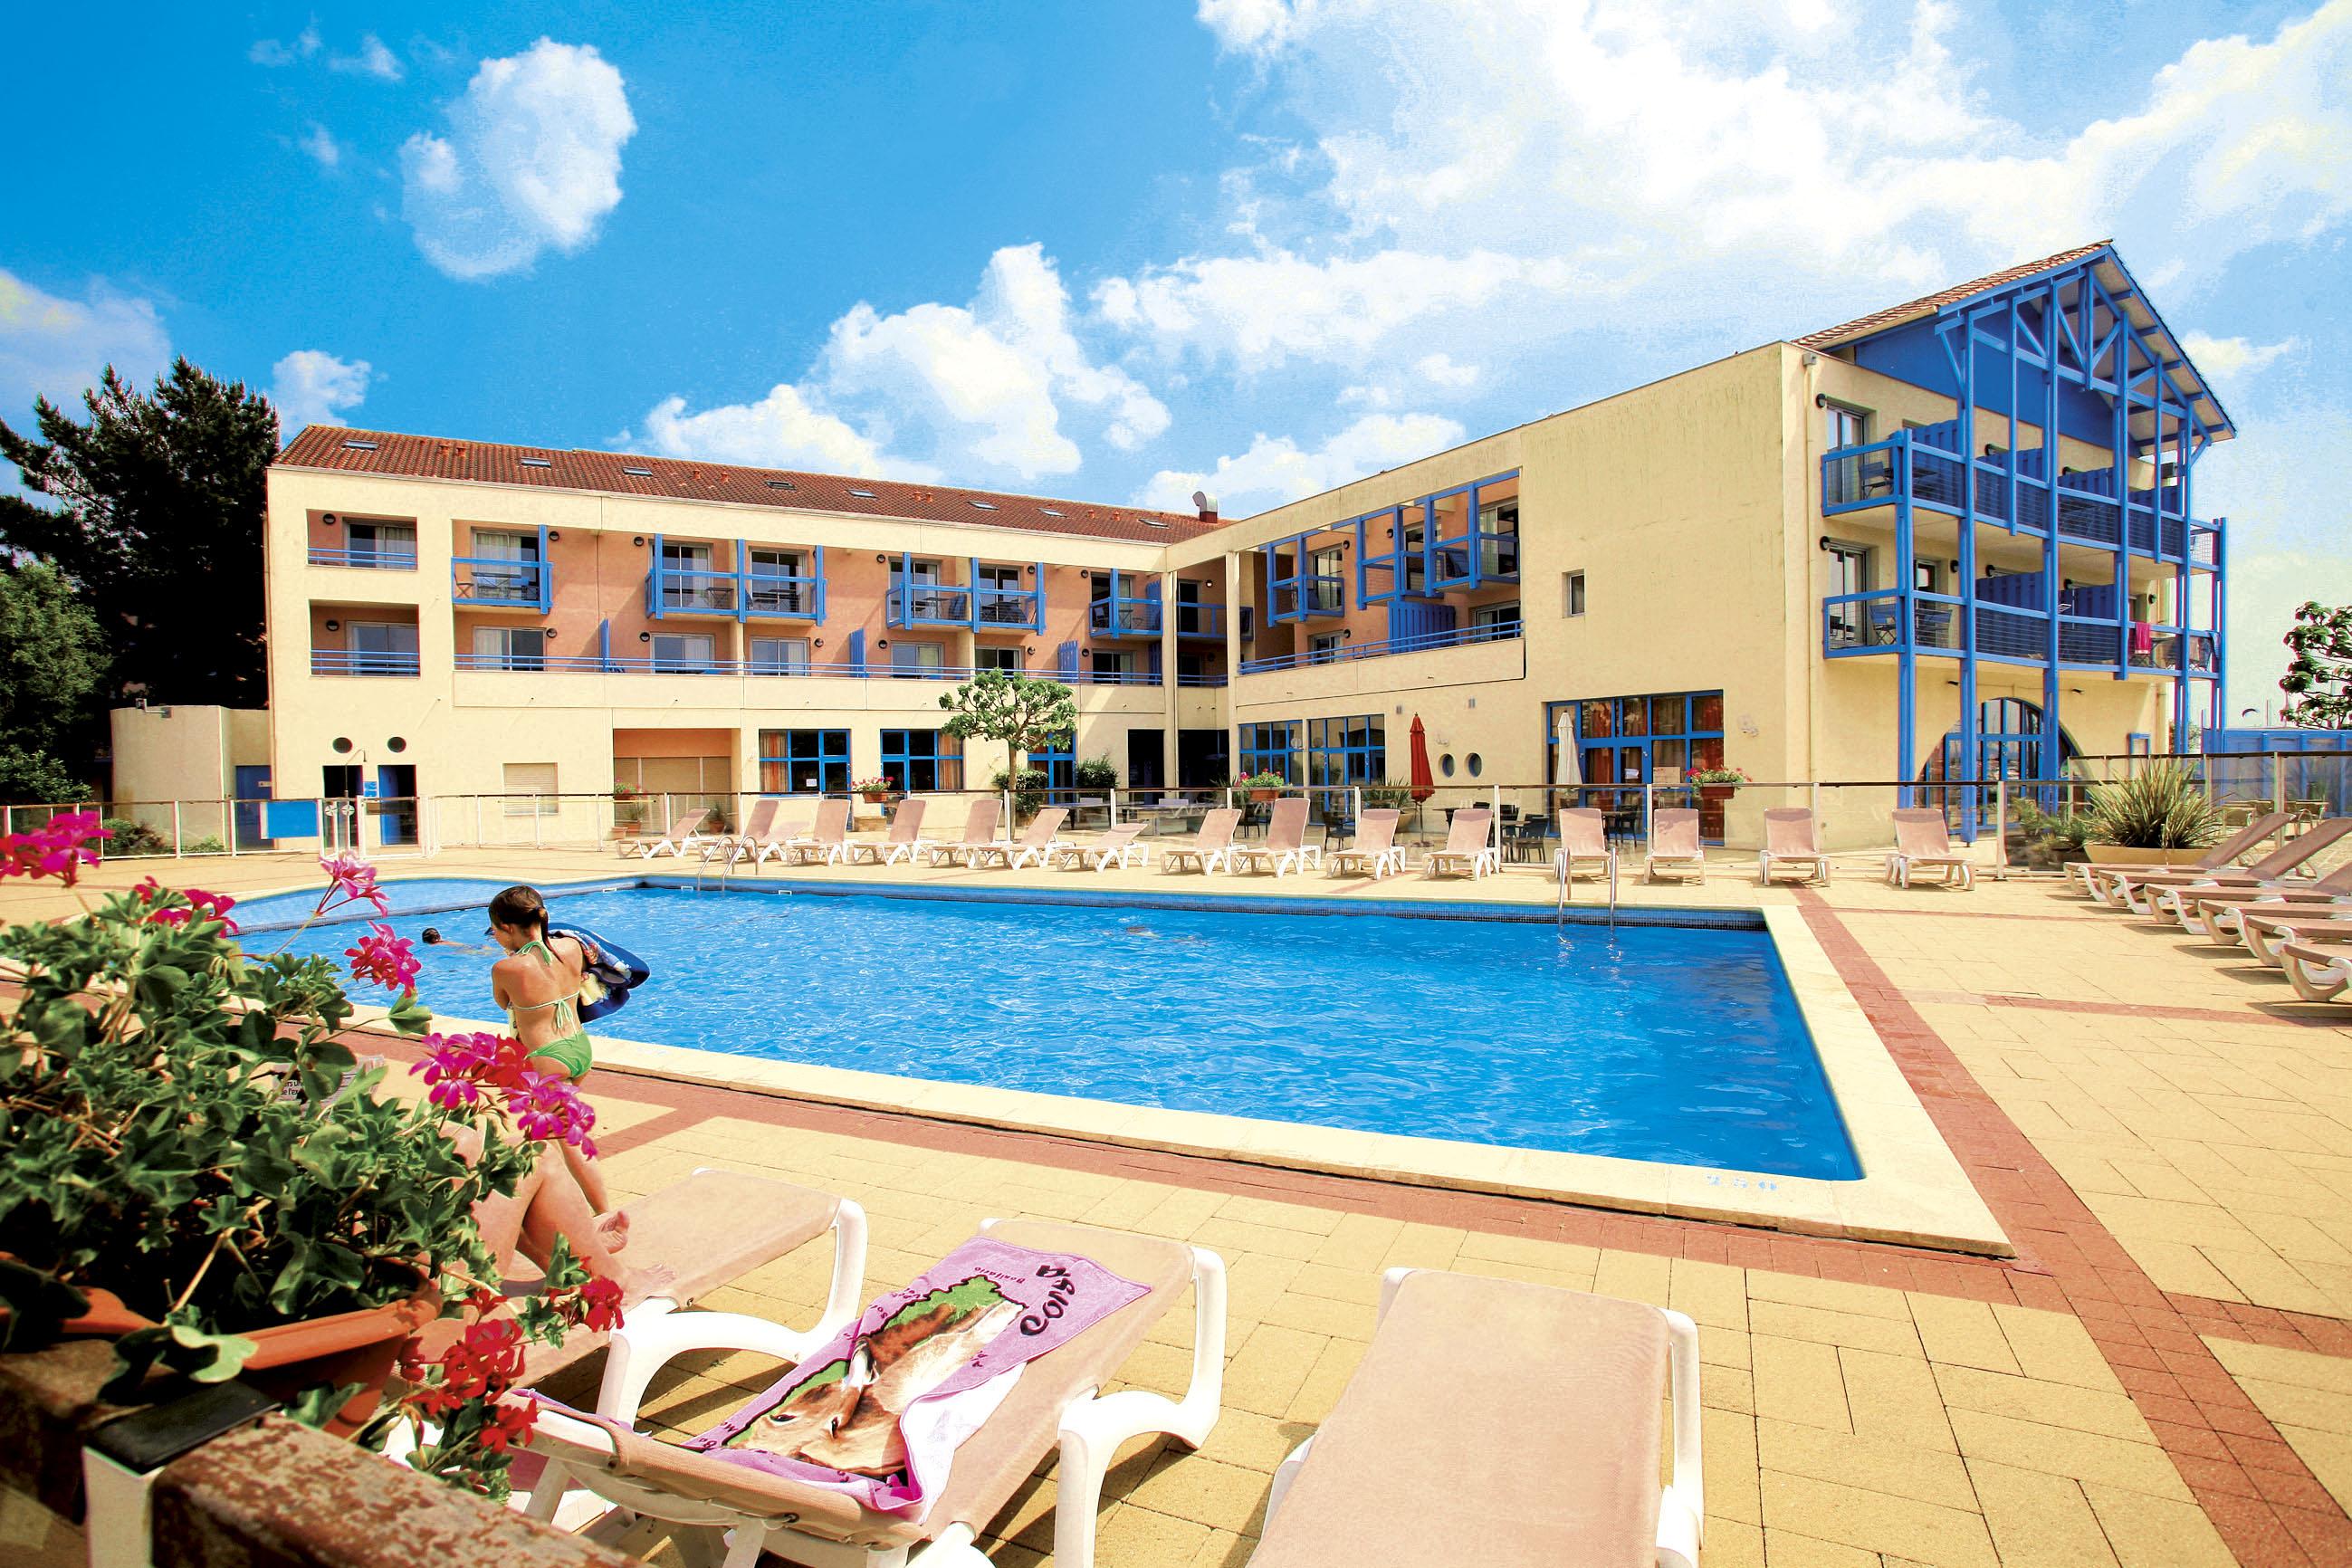 Odalys vacances r sidence du port hourtin tourisme for Piscine du port marchand